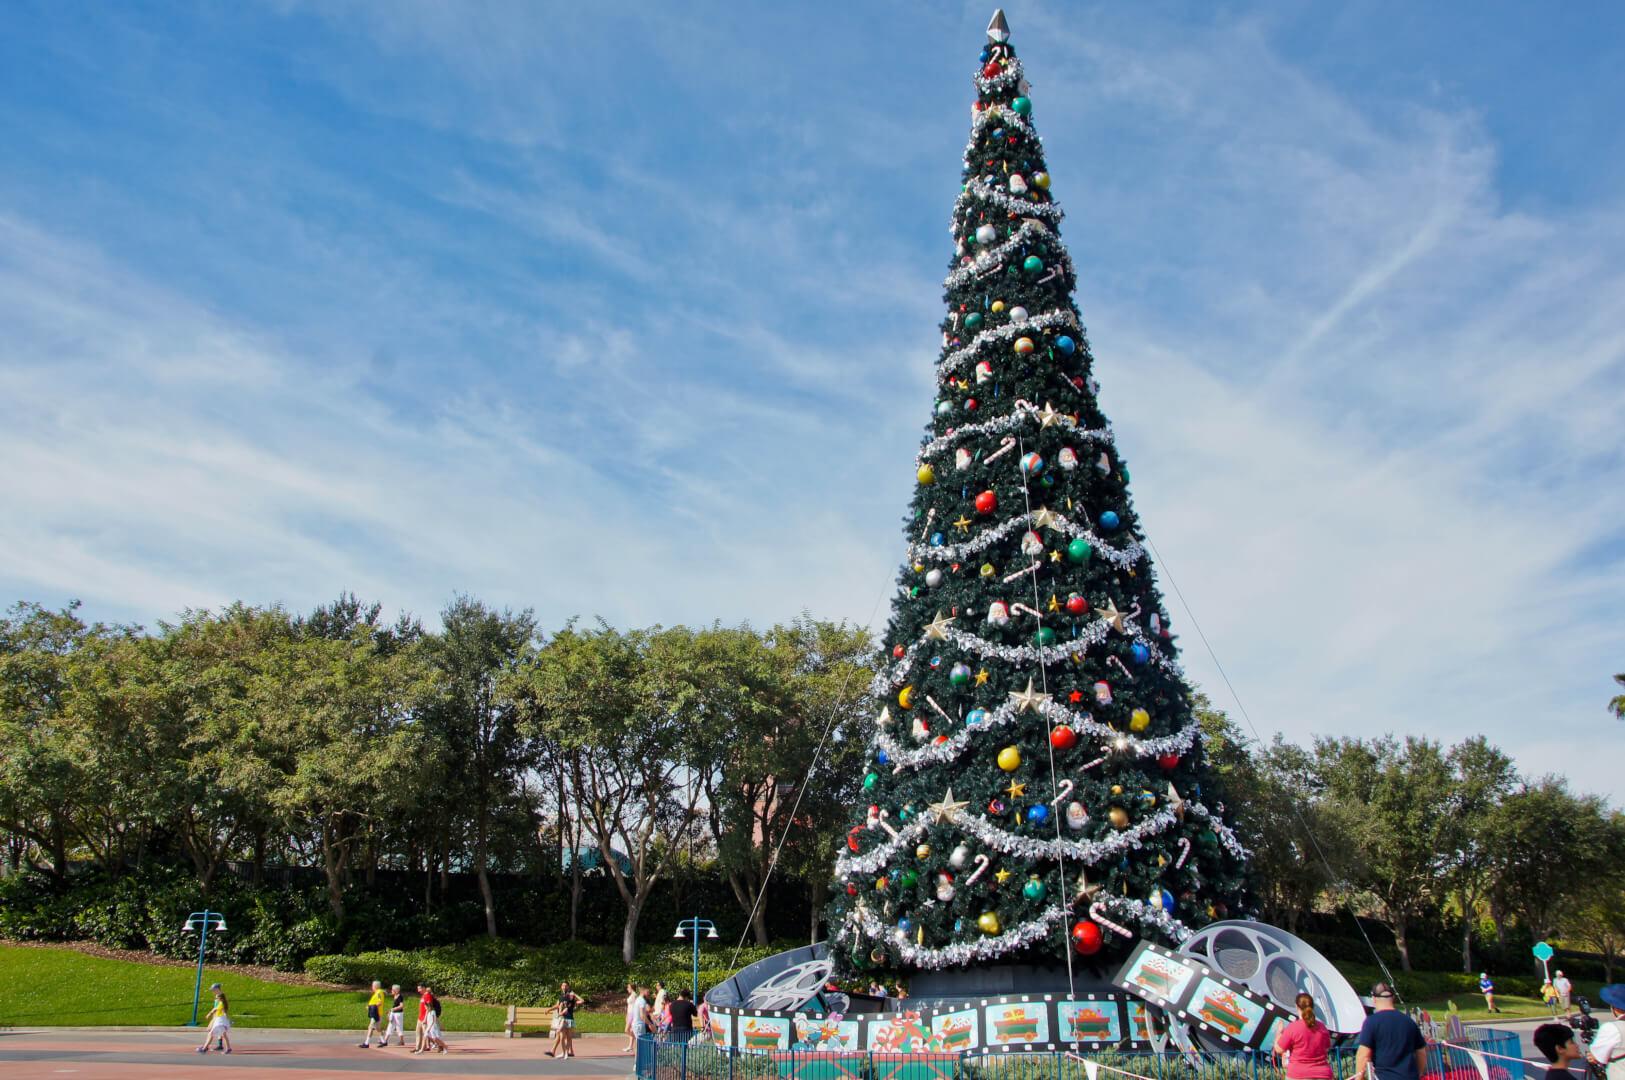 ParkSpotting at Disney's Hollywood Studios: Christmas Wrap-Up ...